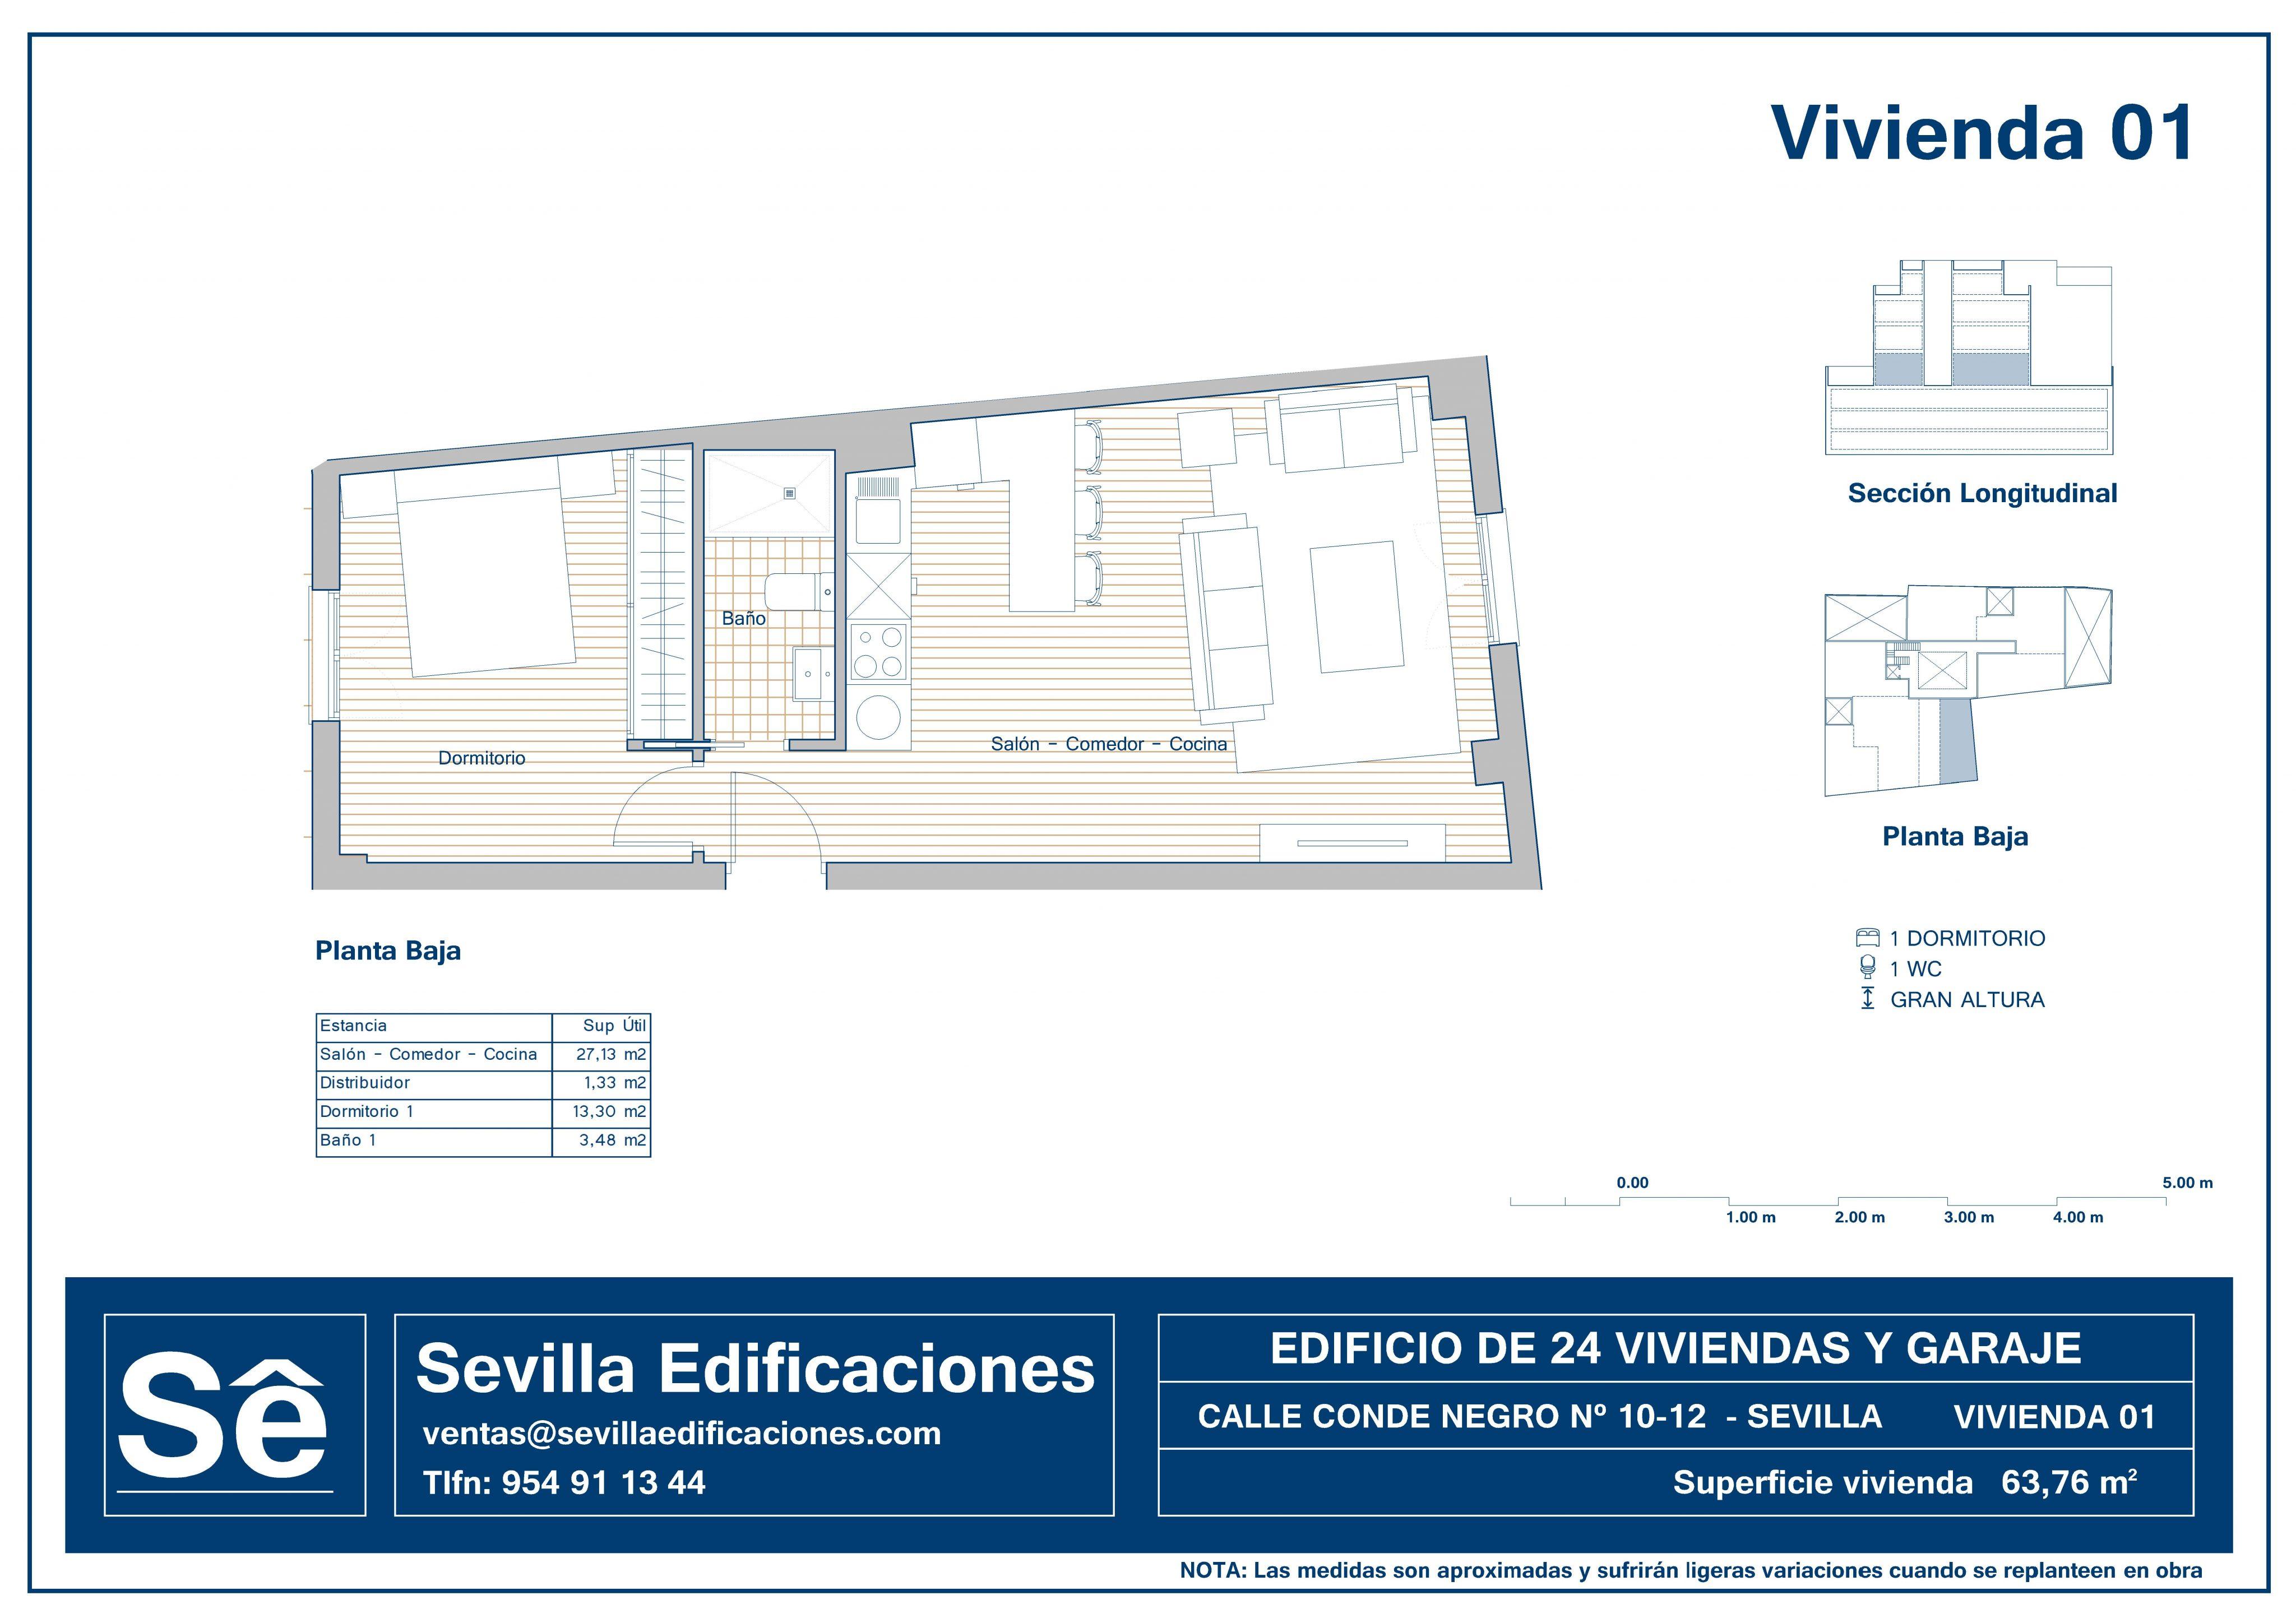 CONDENEGRO_VIVIENDA_01